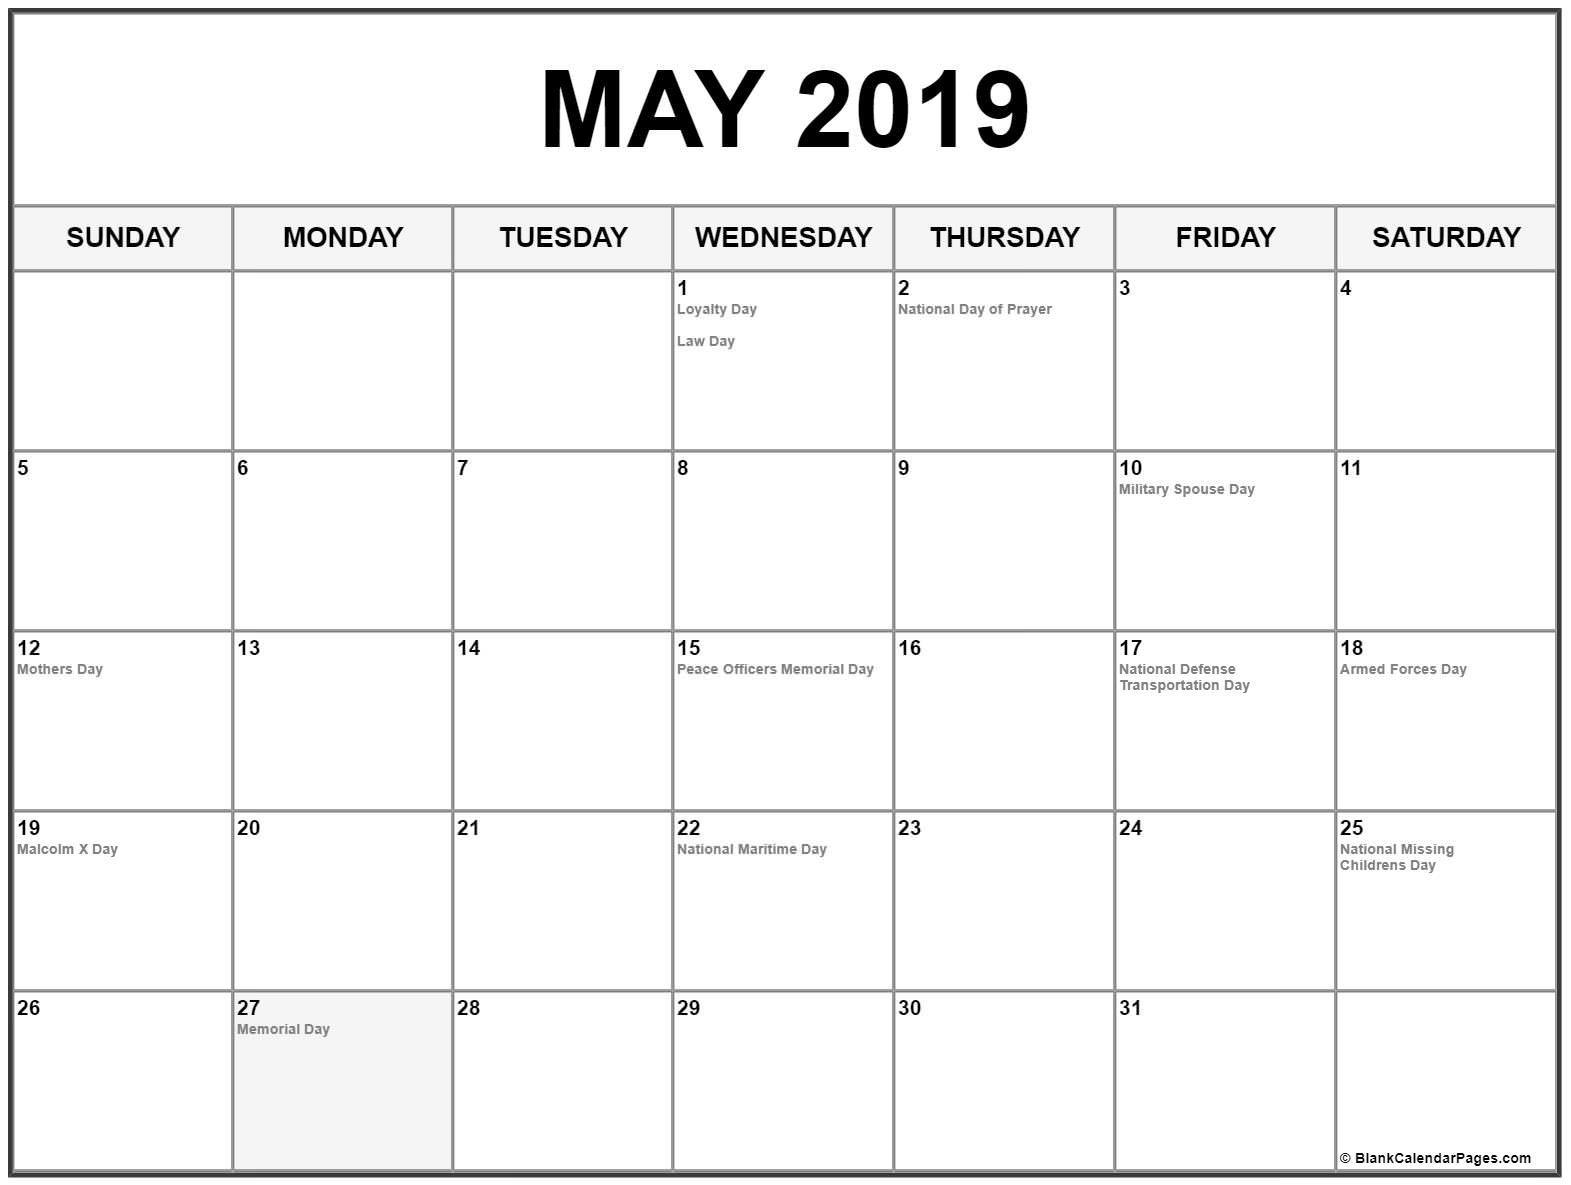 May 2019 Calendar Us Holidays | Printable Monthly Calendar